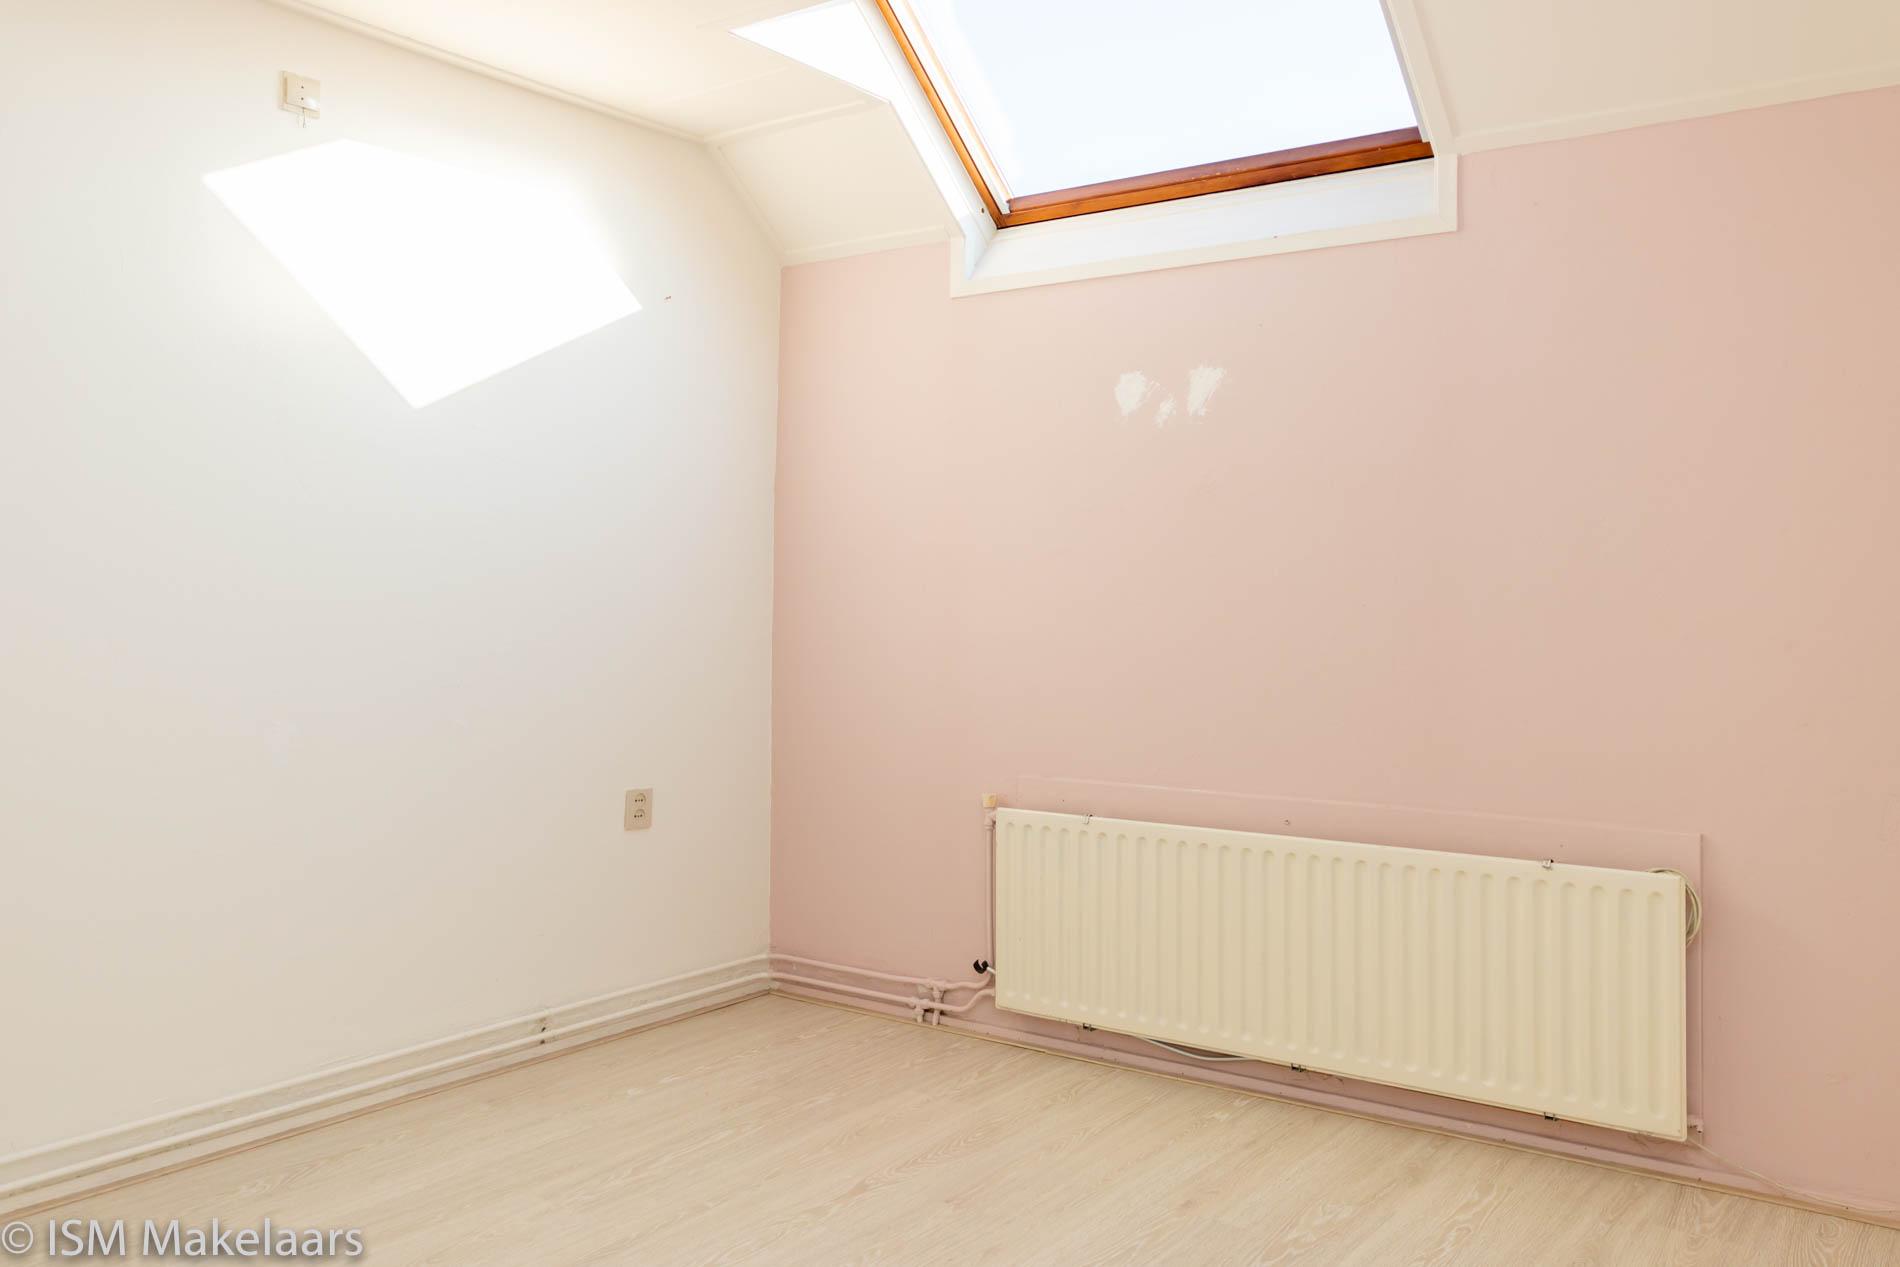 slaapkamer clara